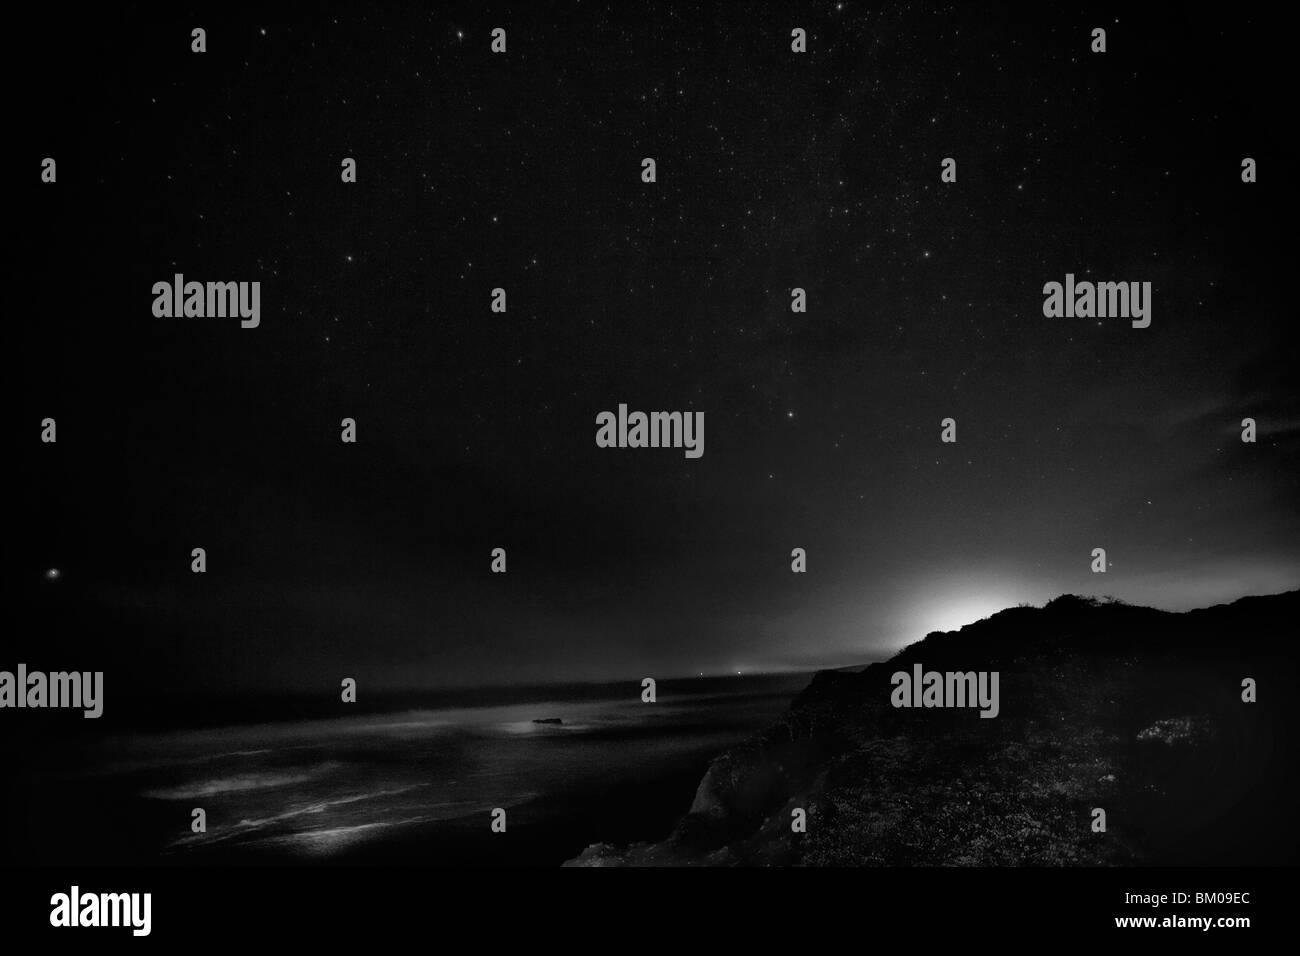 Ocean at night in Cambria, CA. - Stock Image